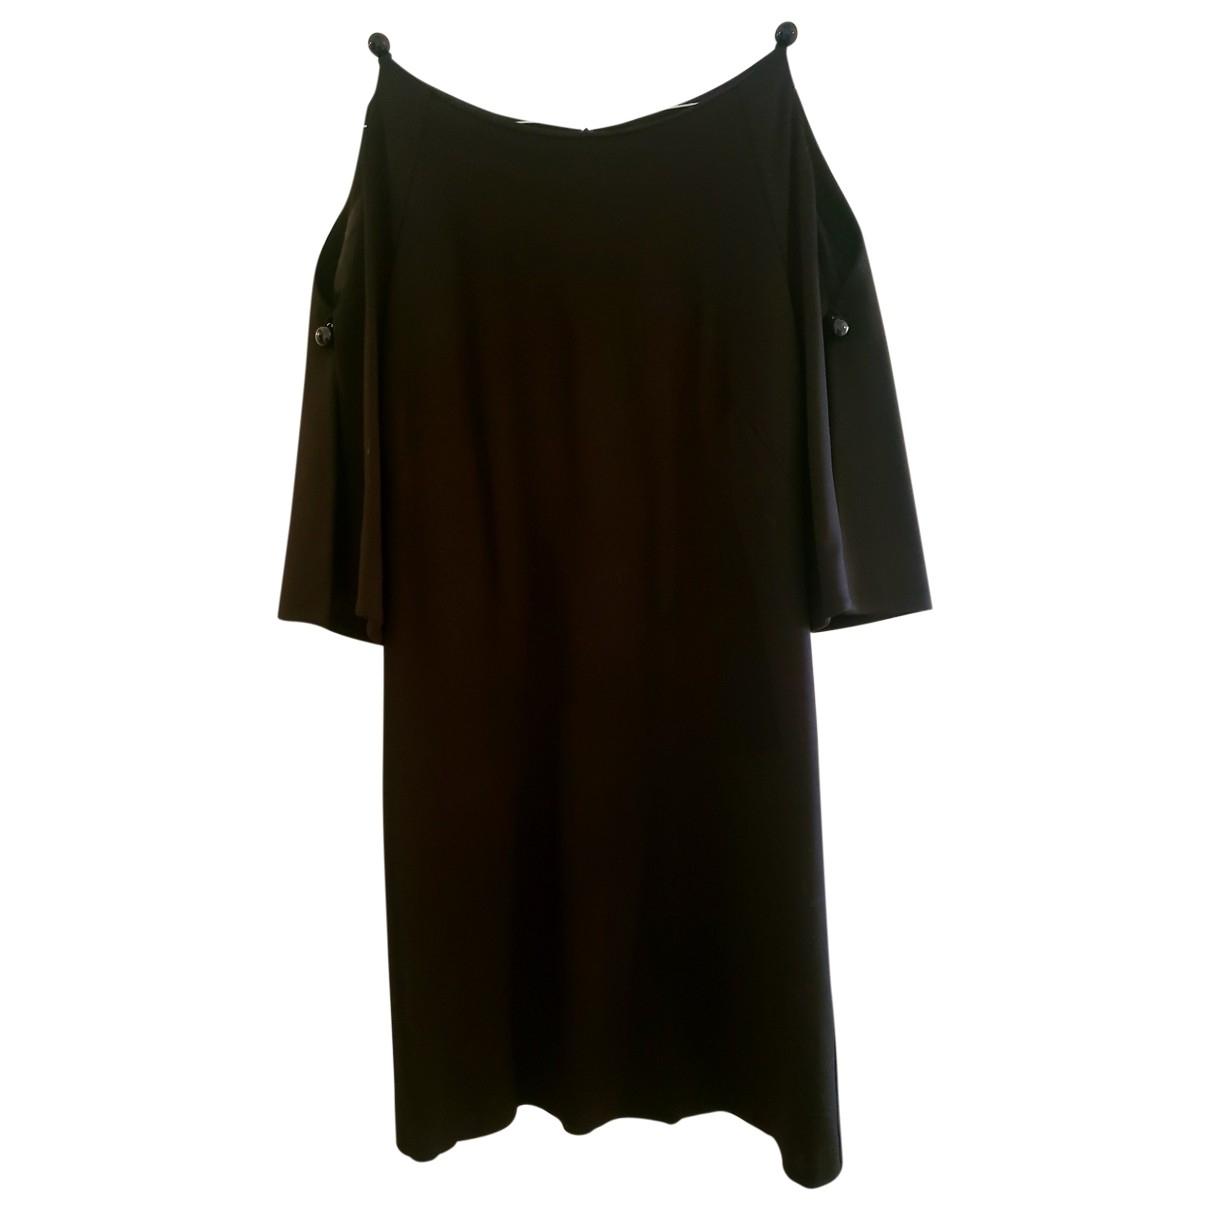 Trina Turk \N Black Wool dress for Women M International